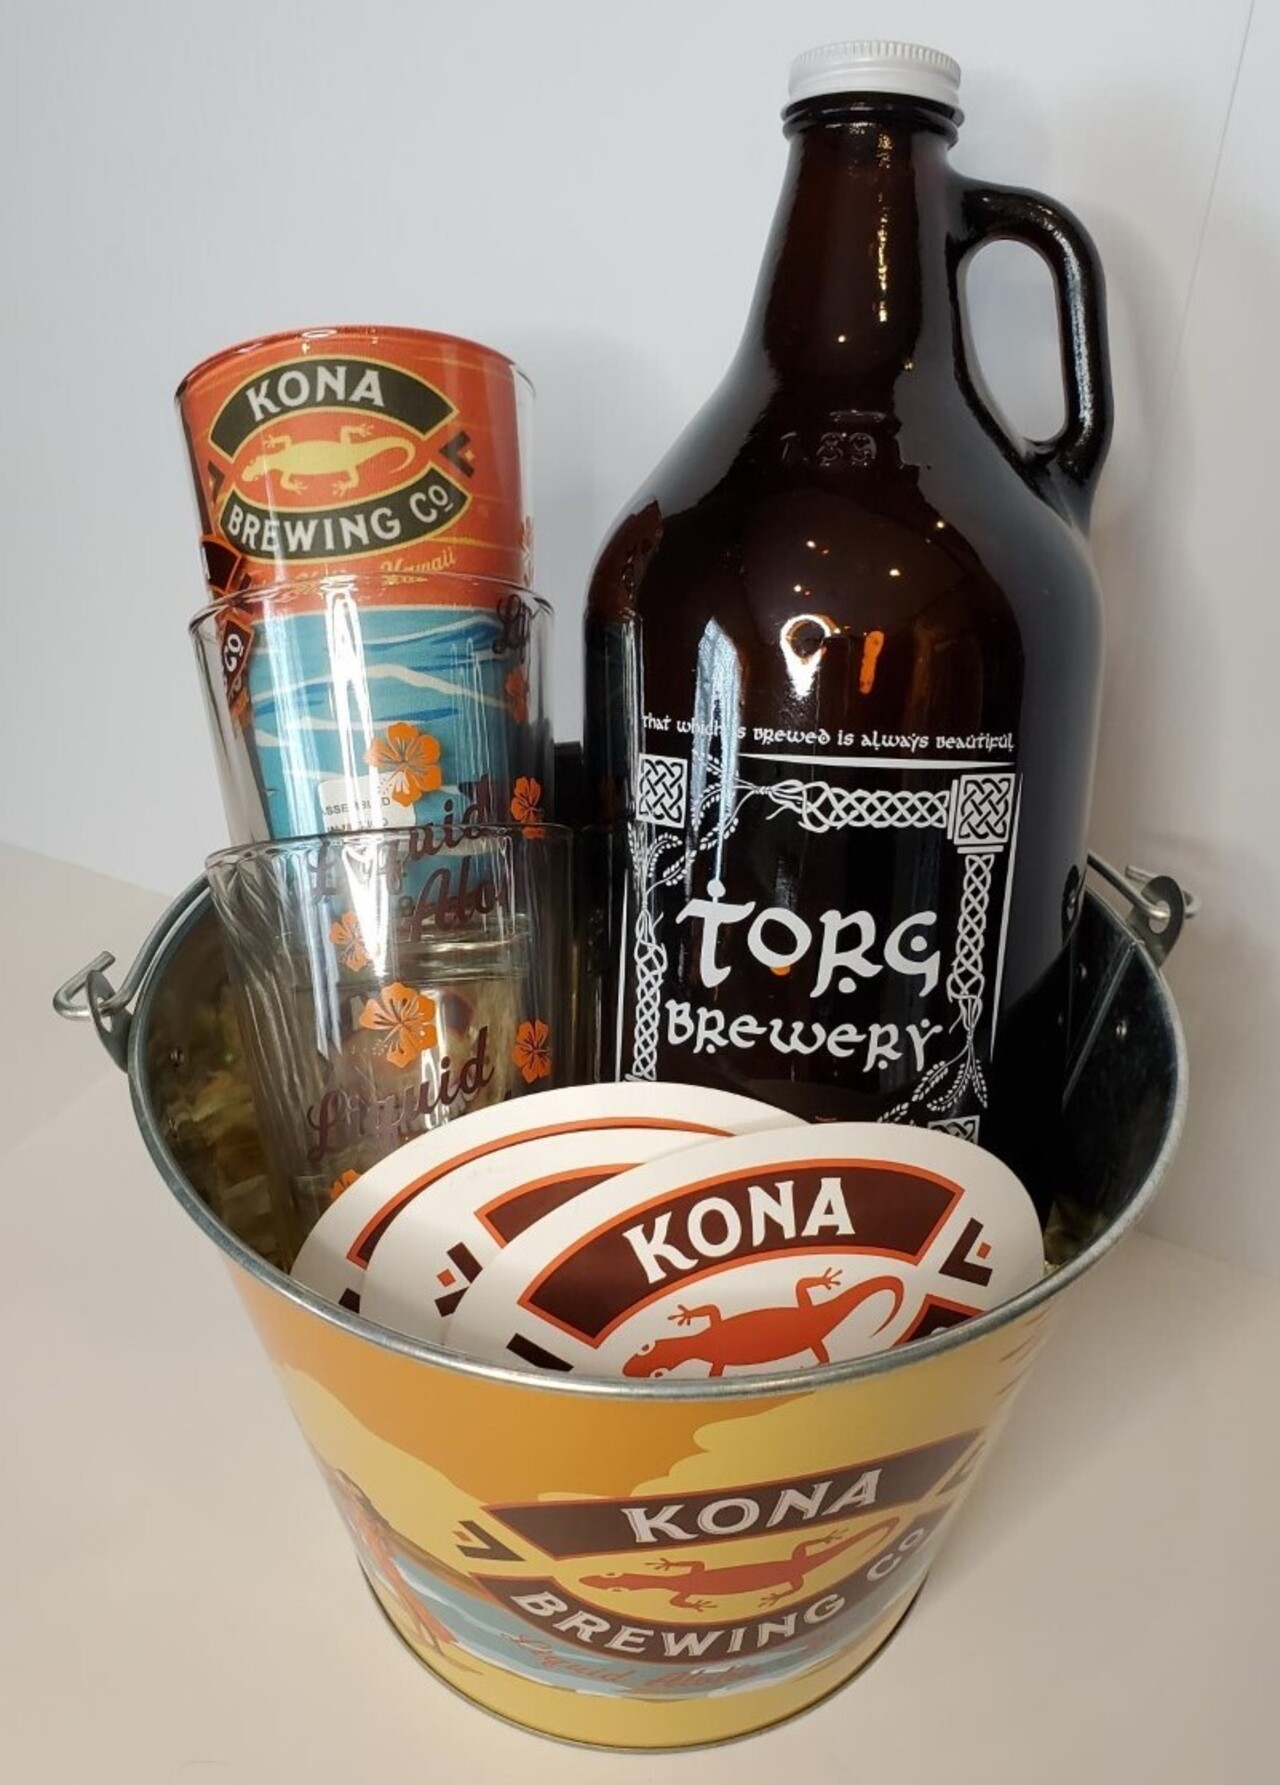 424. Kona and Torg Brewery 2